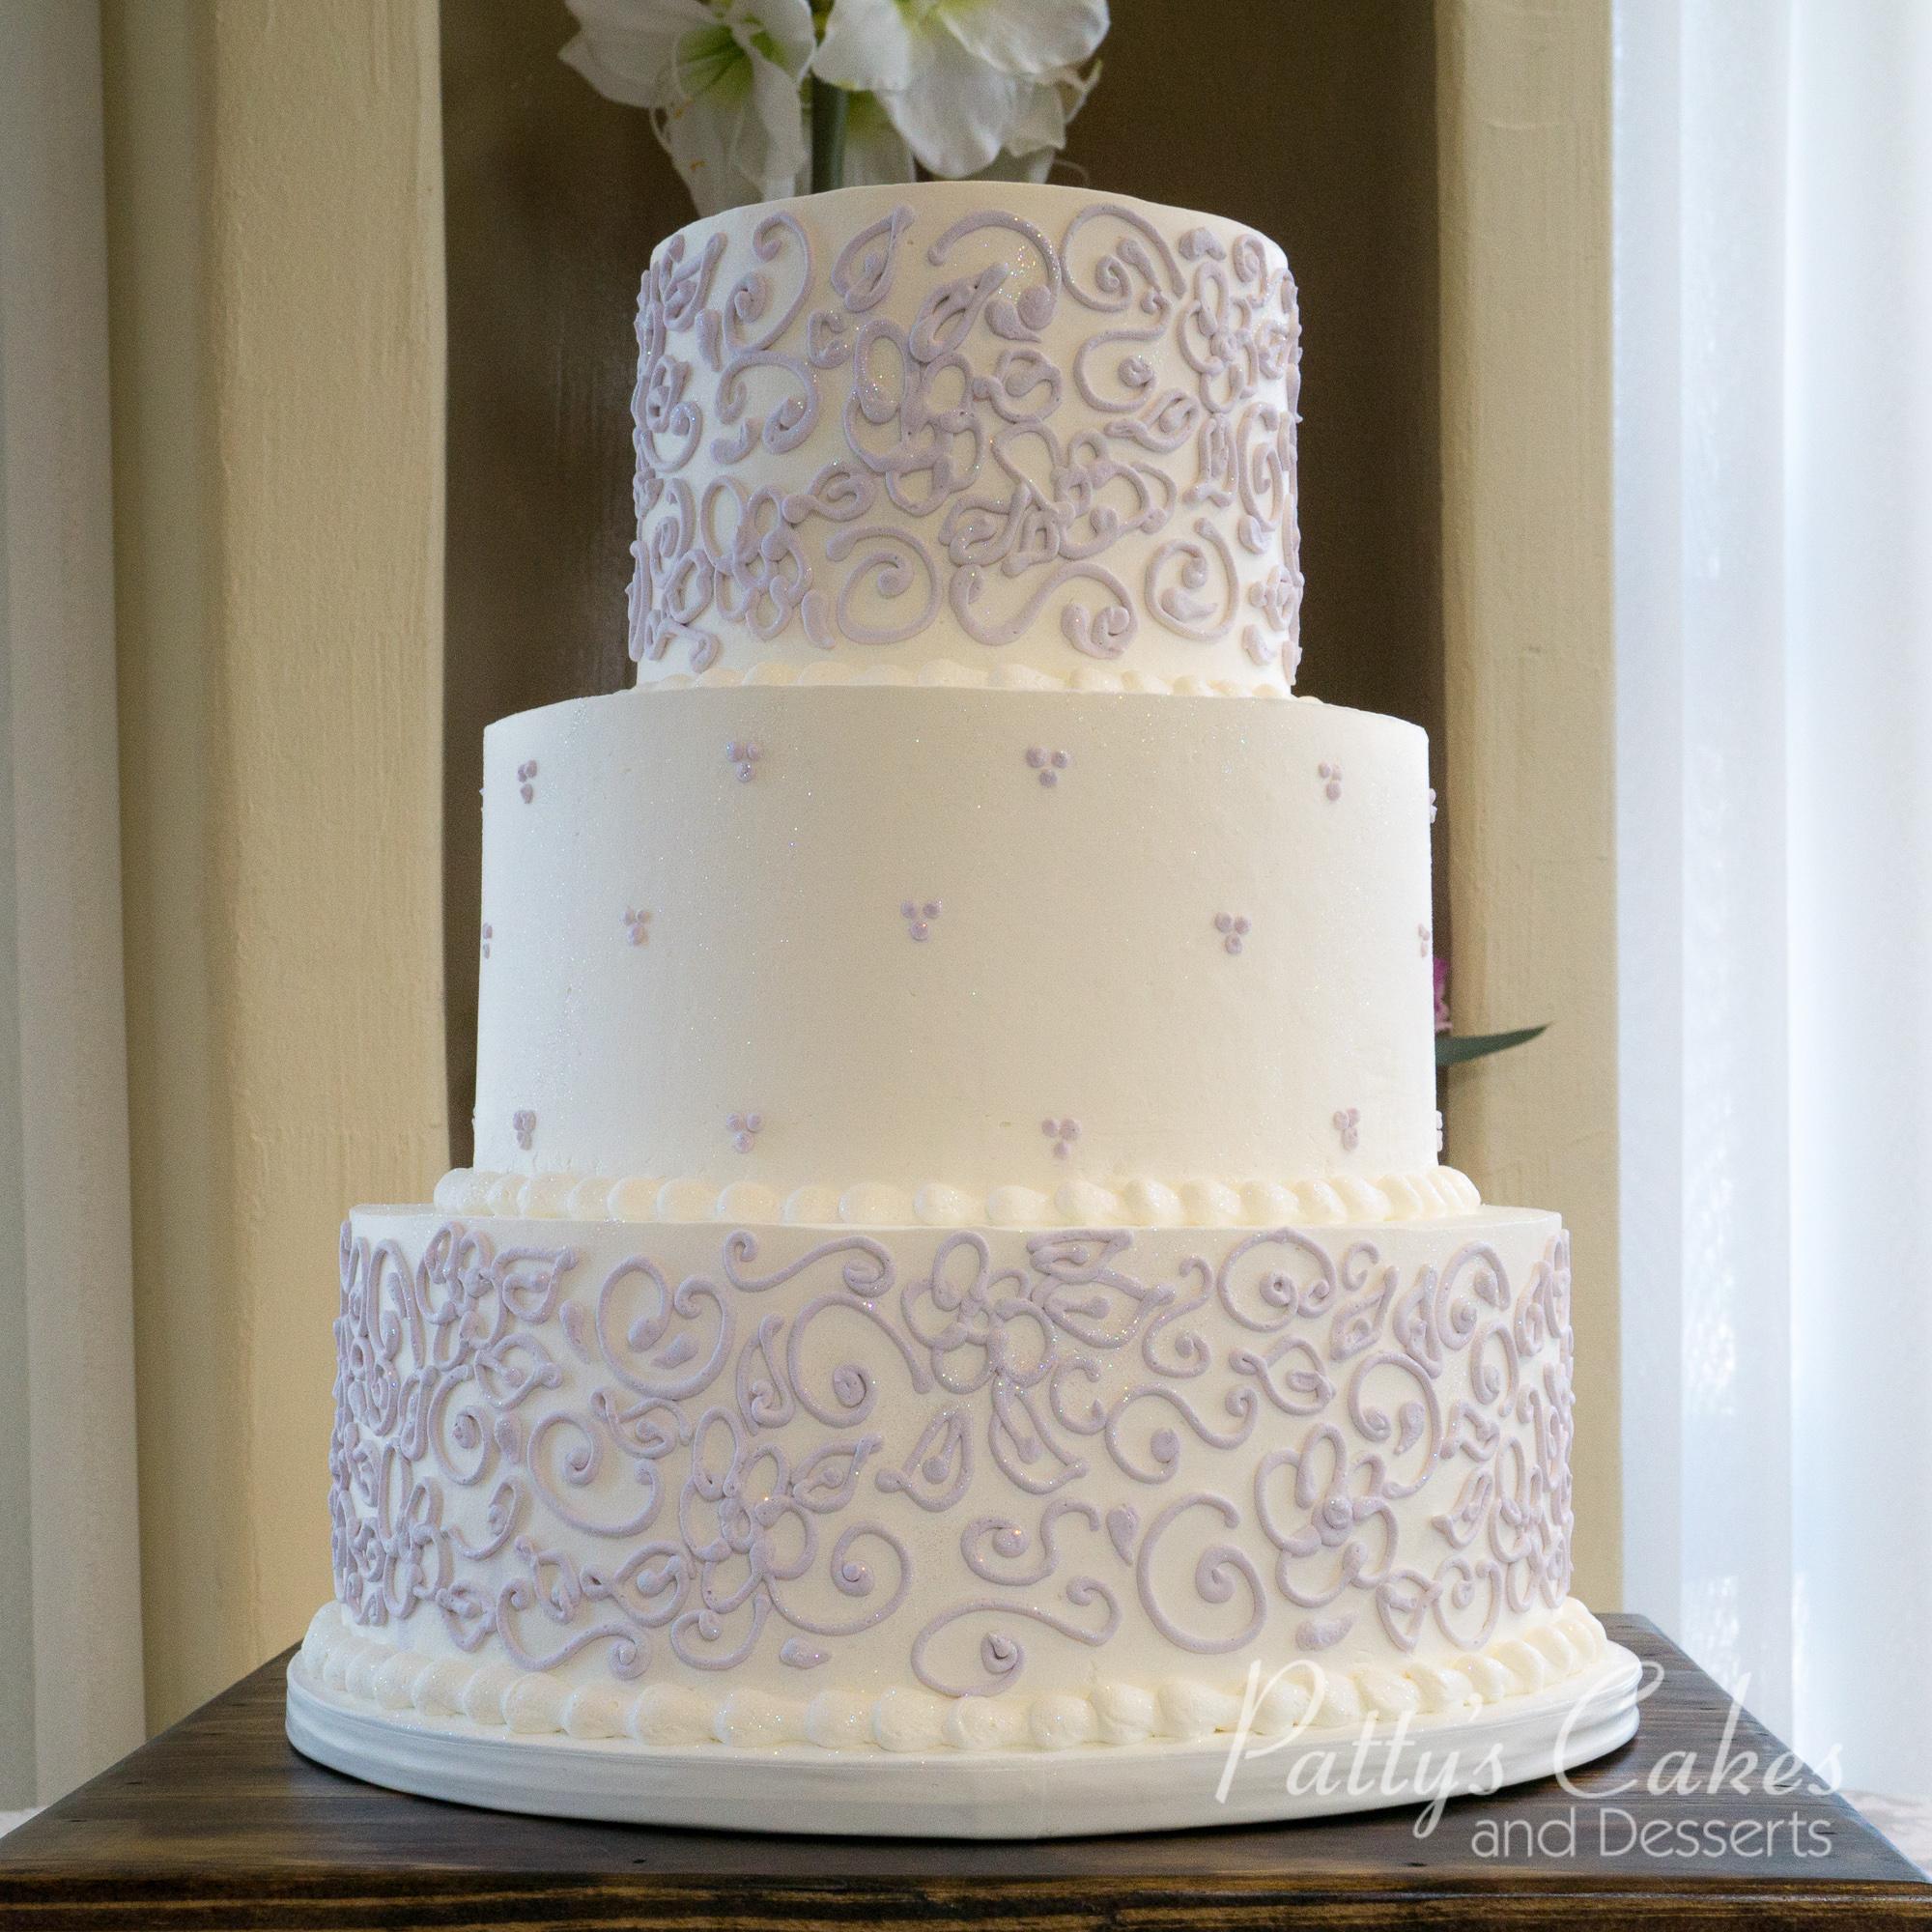 of a white purple wedding cake flowers Patty s